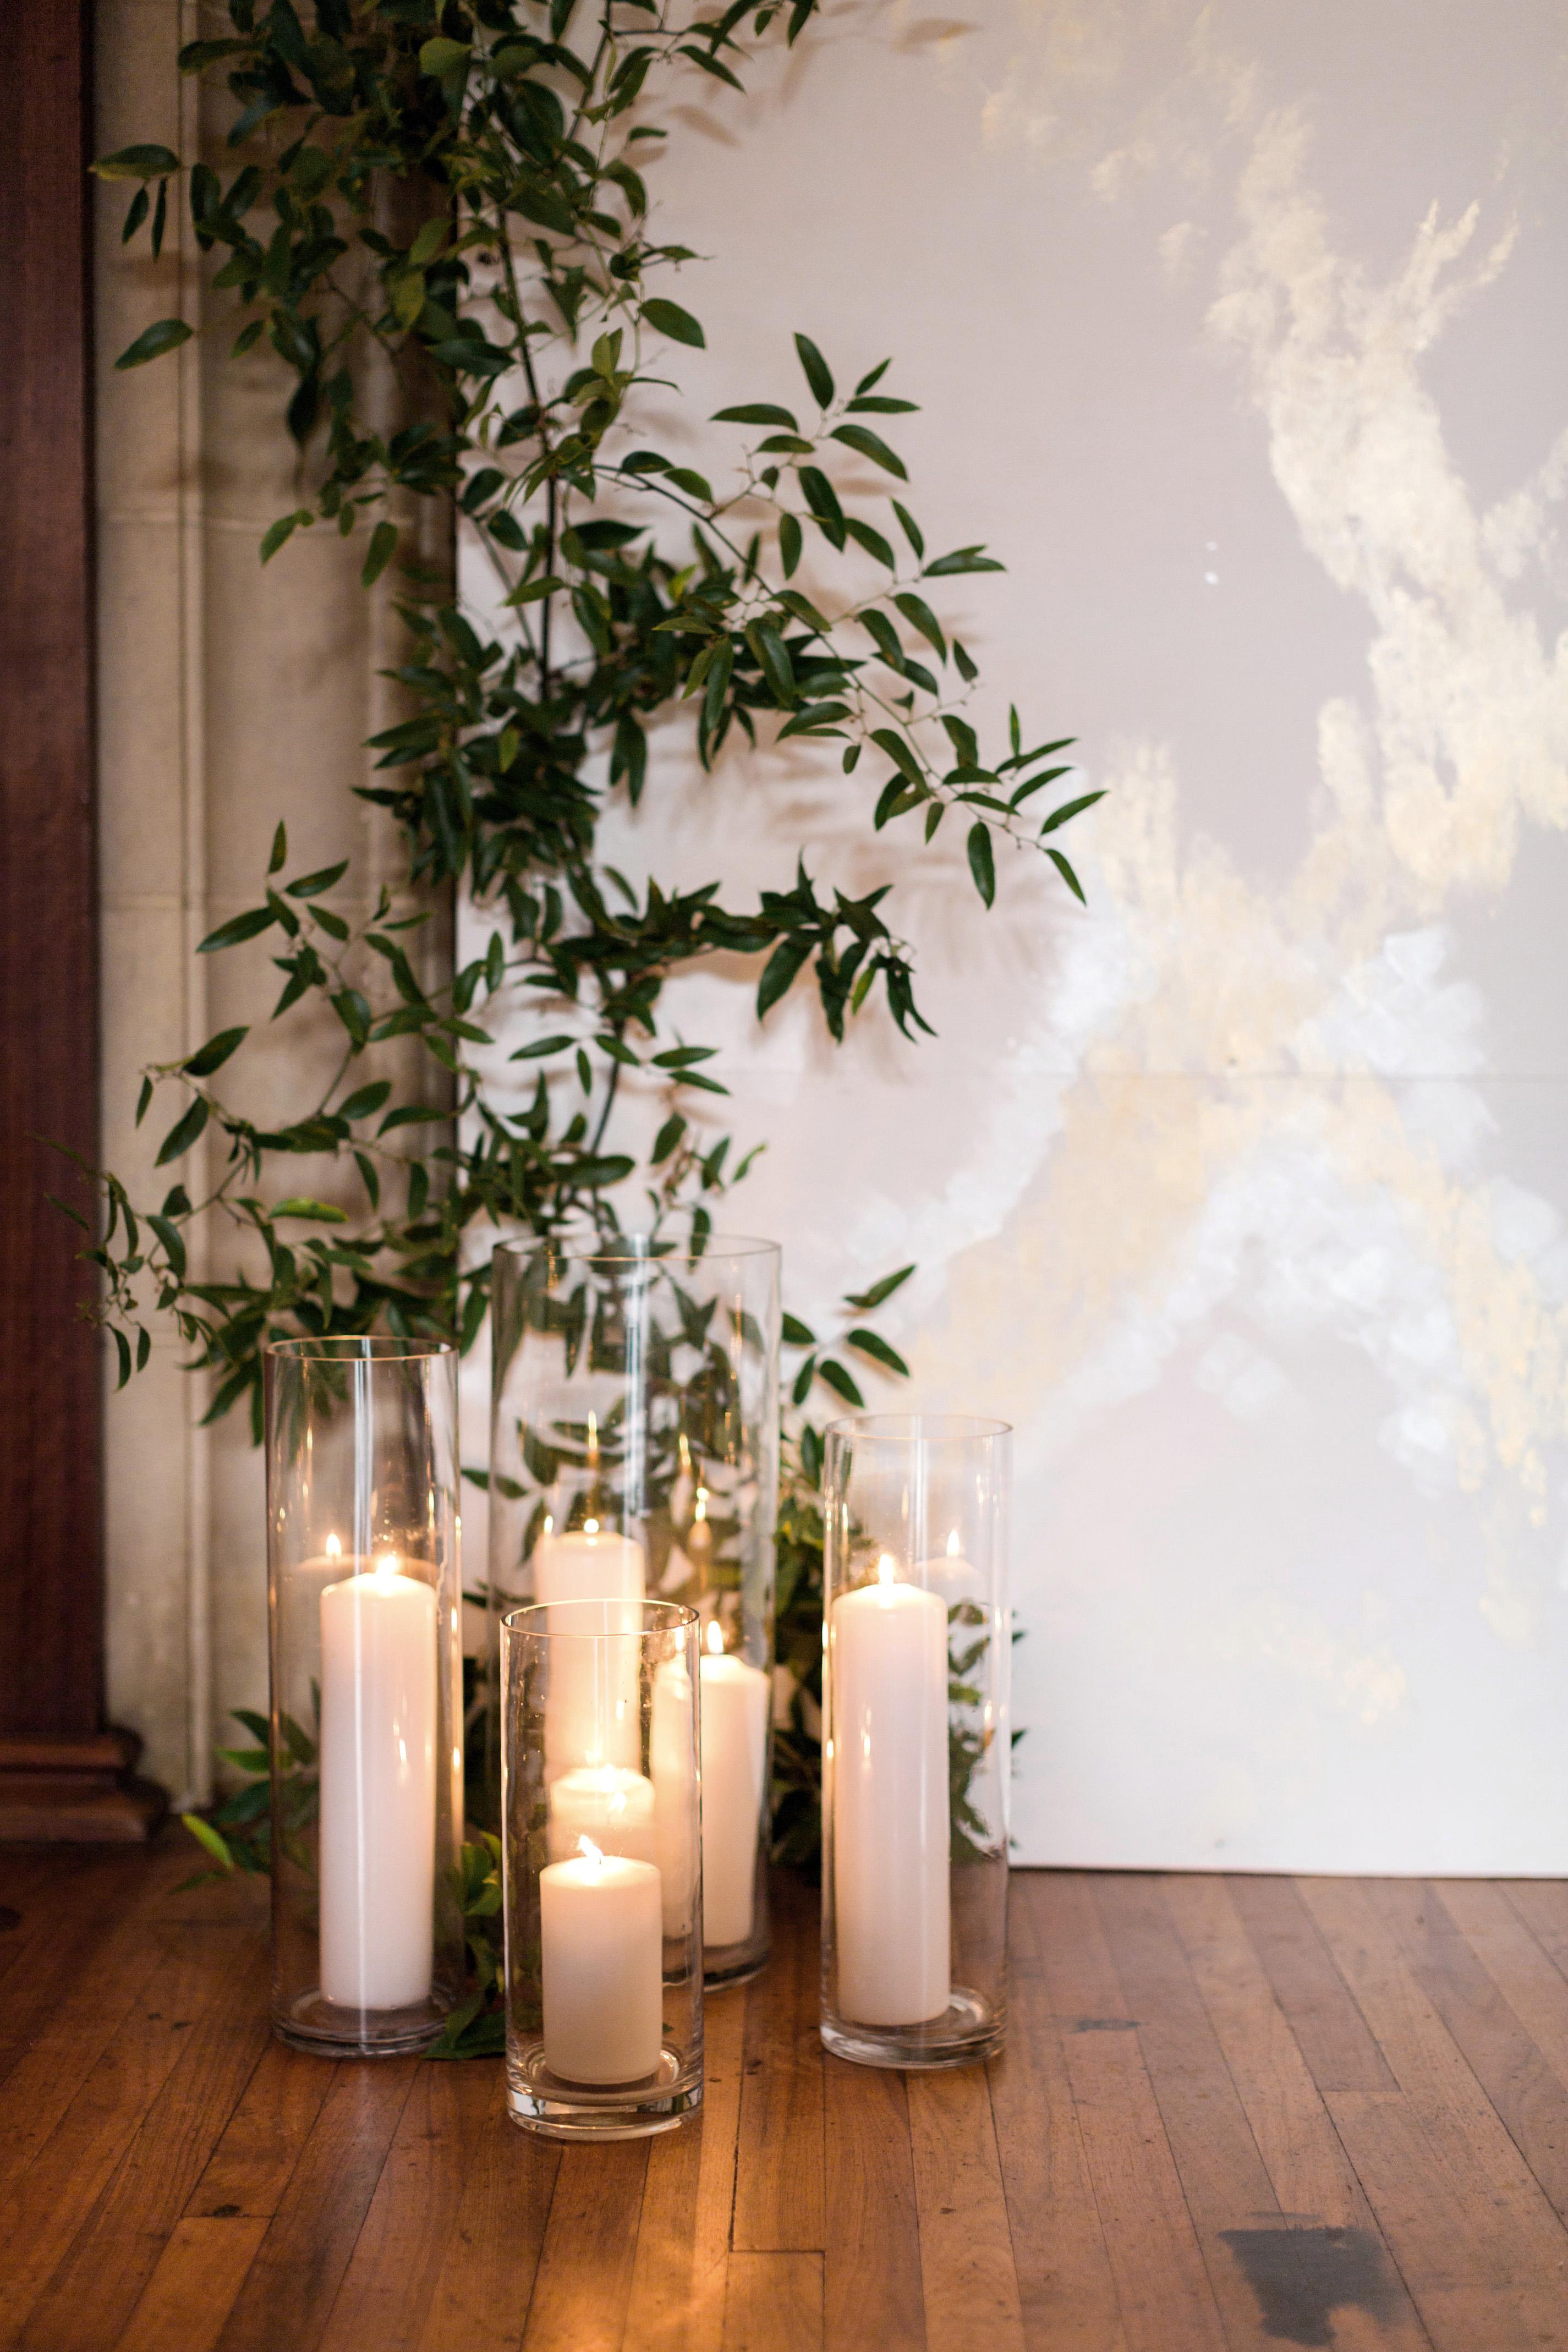 Silk Wedding Flowers Atlanta Ga : Elegant callanwolde wedding in atlanta ga the